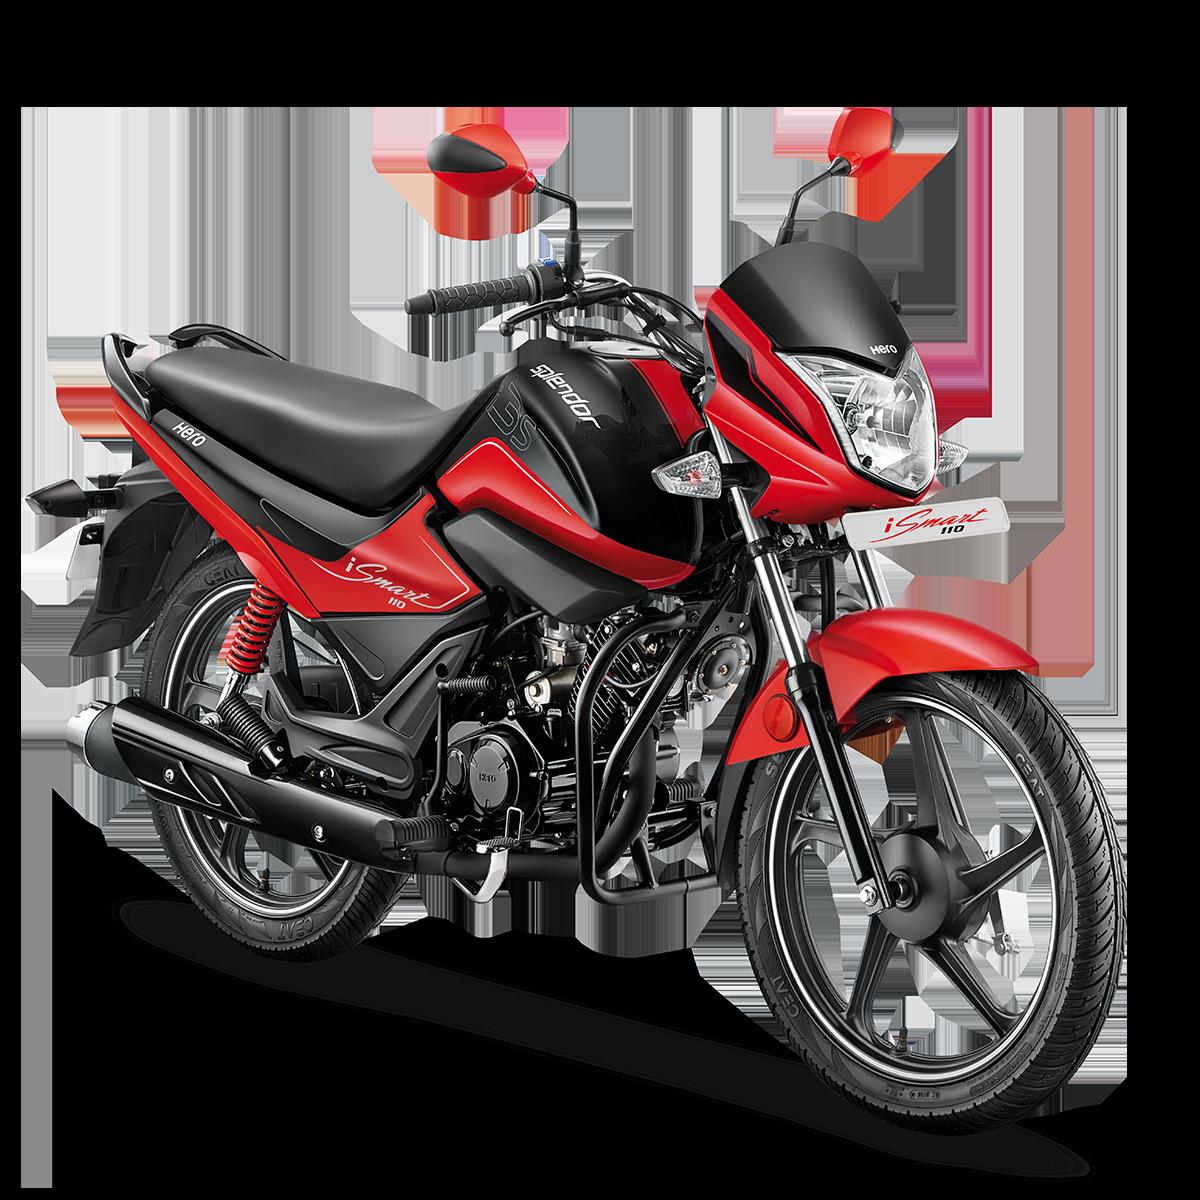 iSMART 110 - Motor: 110cc / Potencia: 9.4 bhpPrecio: $1,250.00